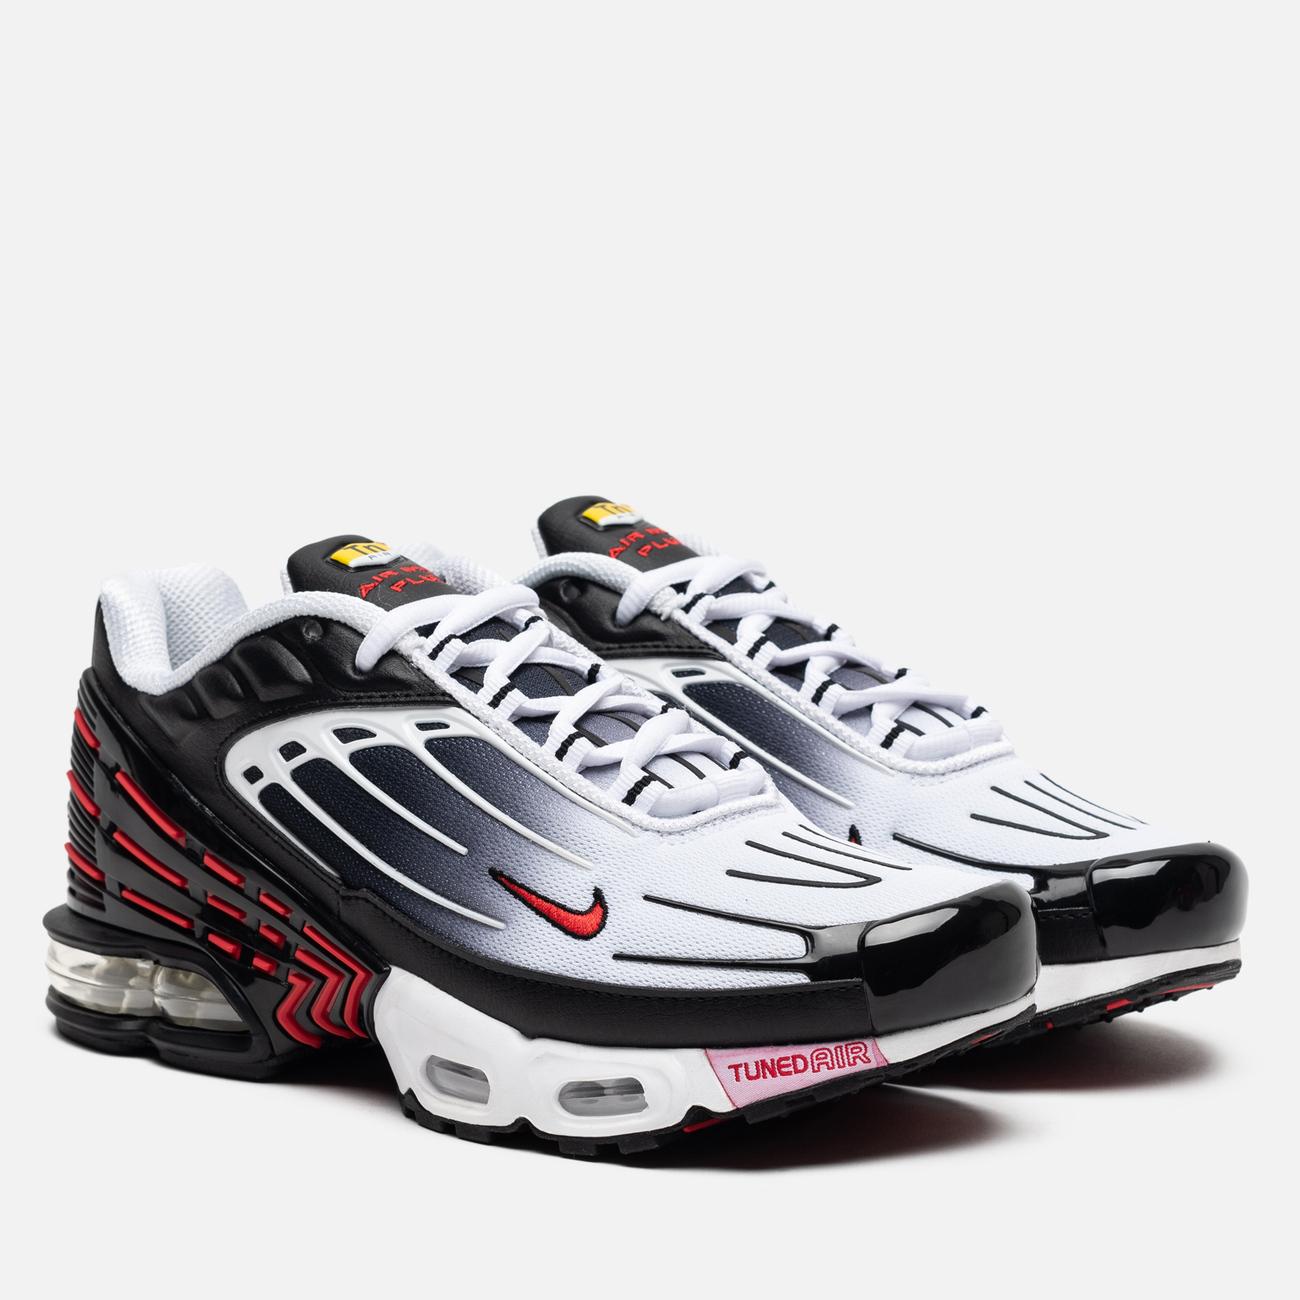 Кроссовки Nike Air Max Plus III Black/University Red/White/Black